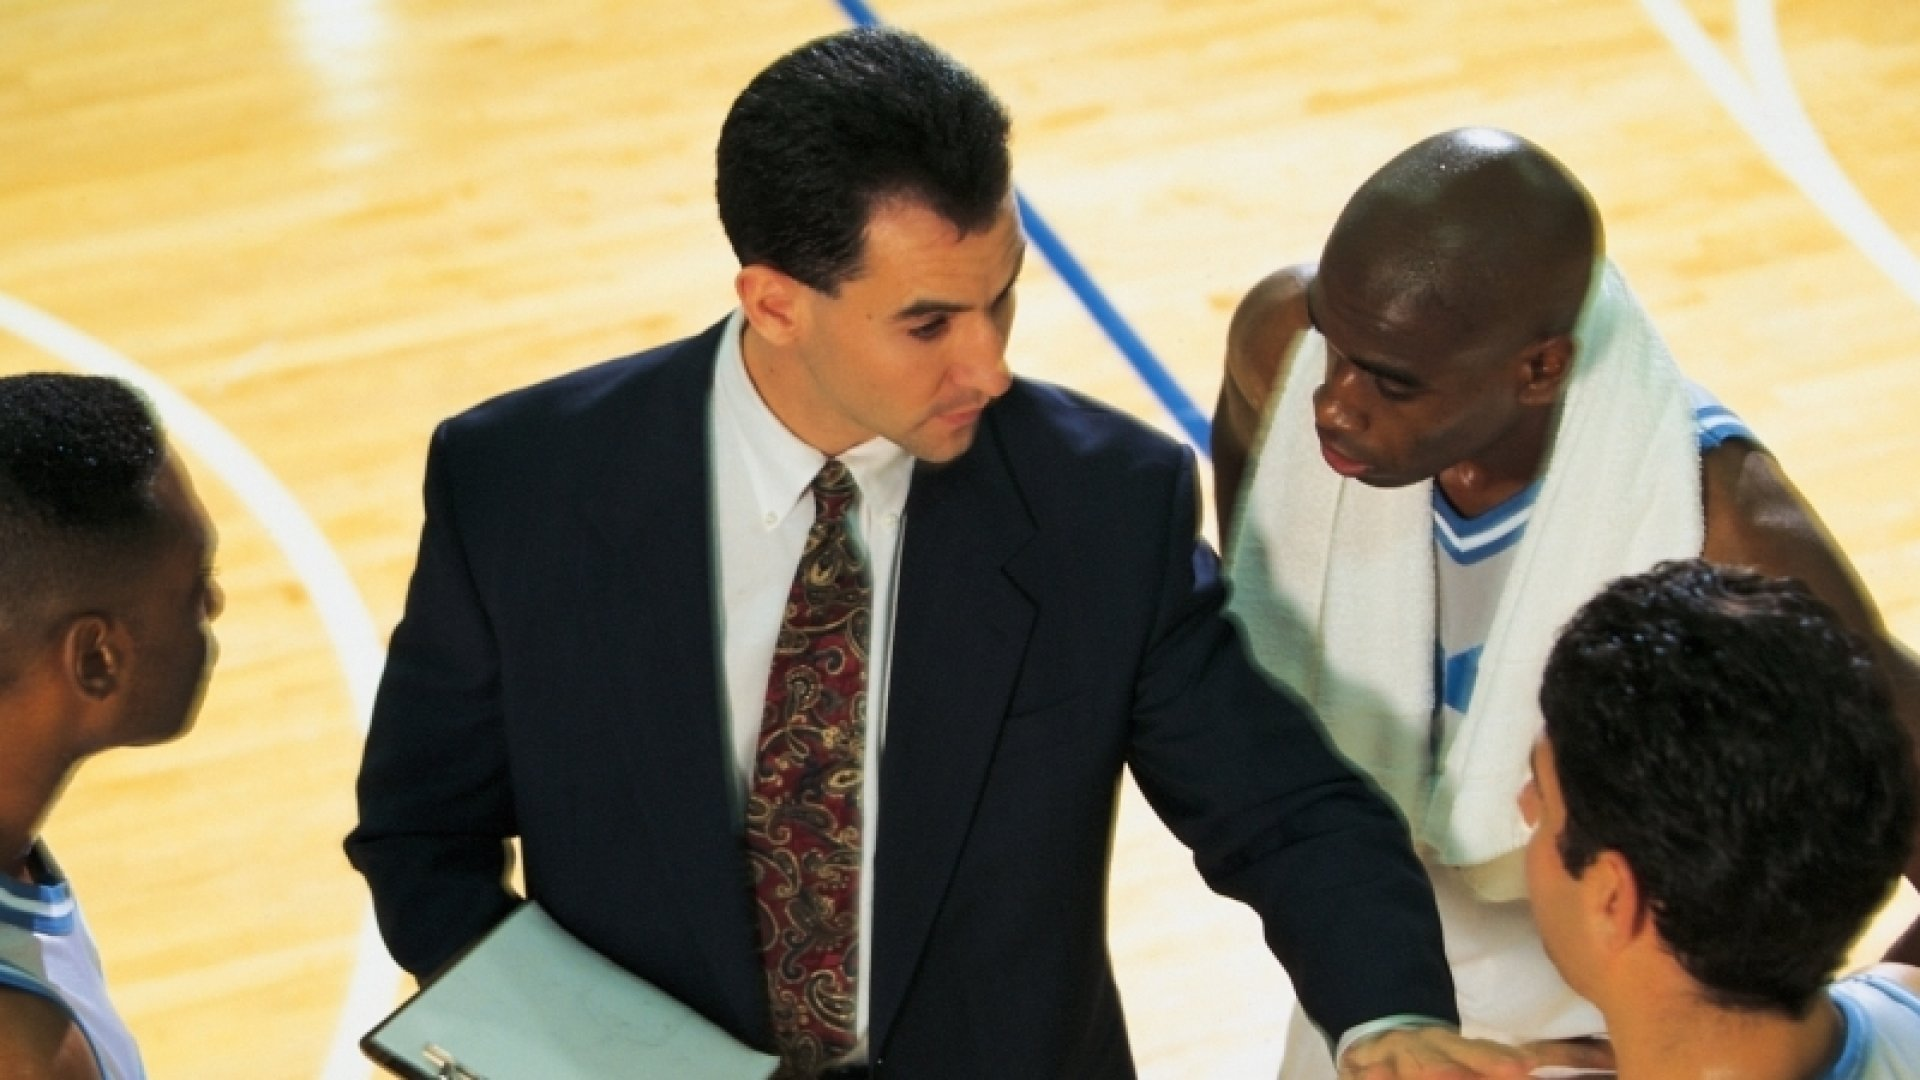 5 Leadership Principles From UVA Basketball Coach Tony Bennett